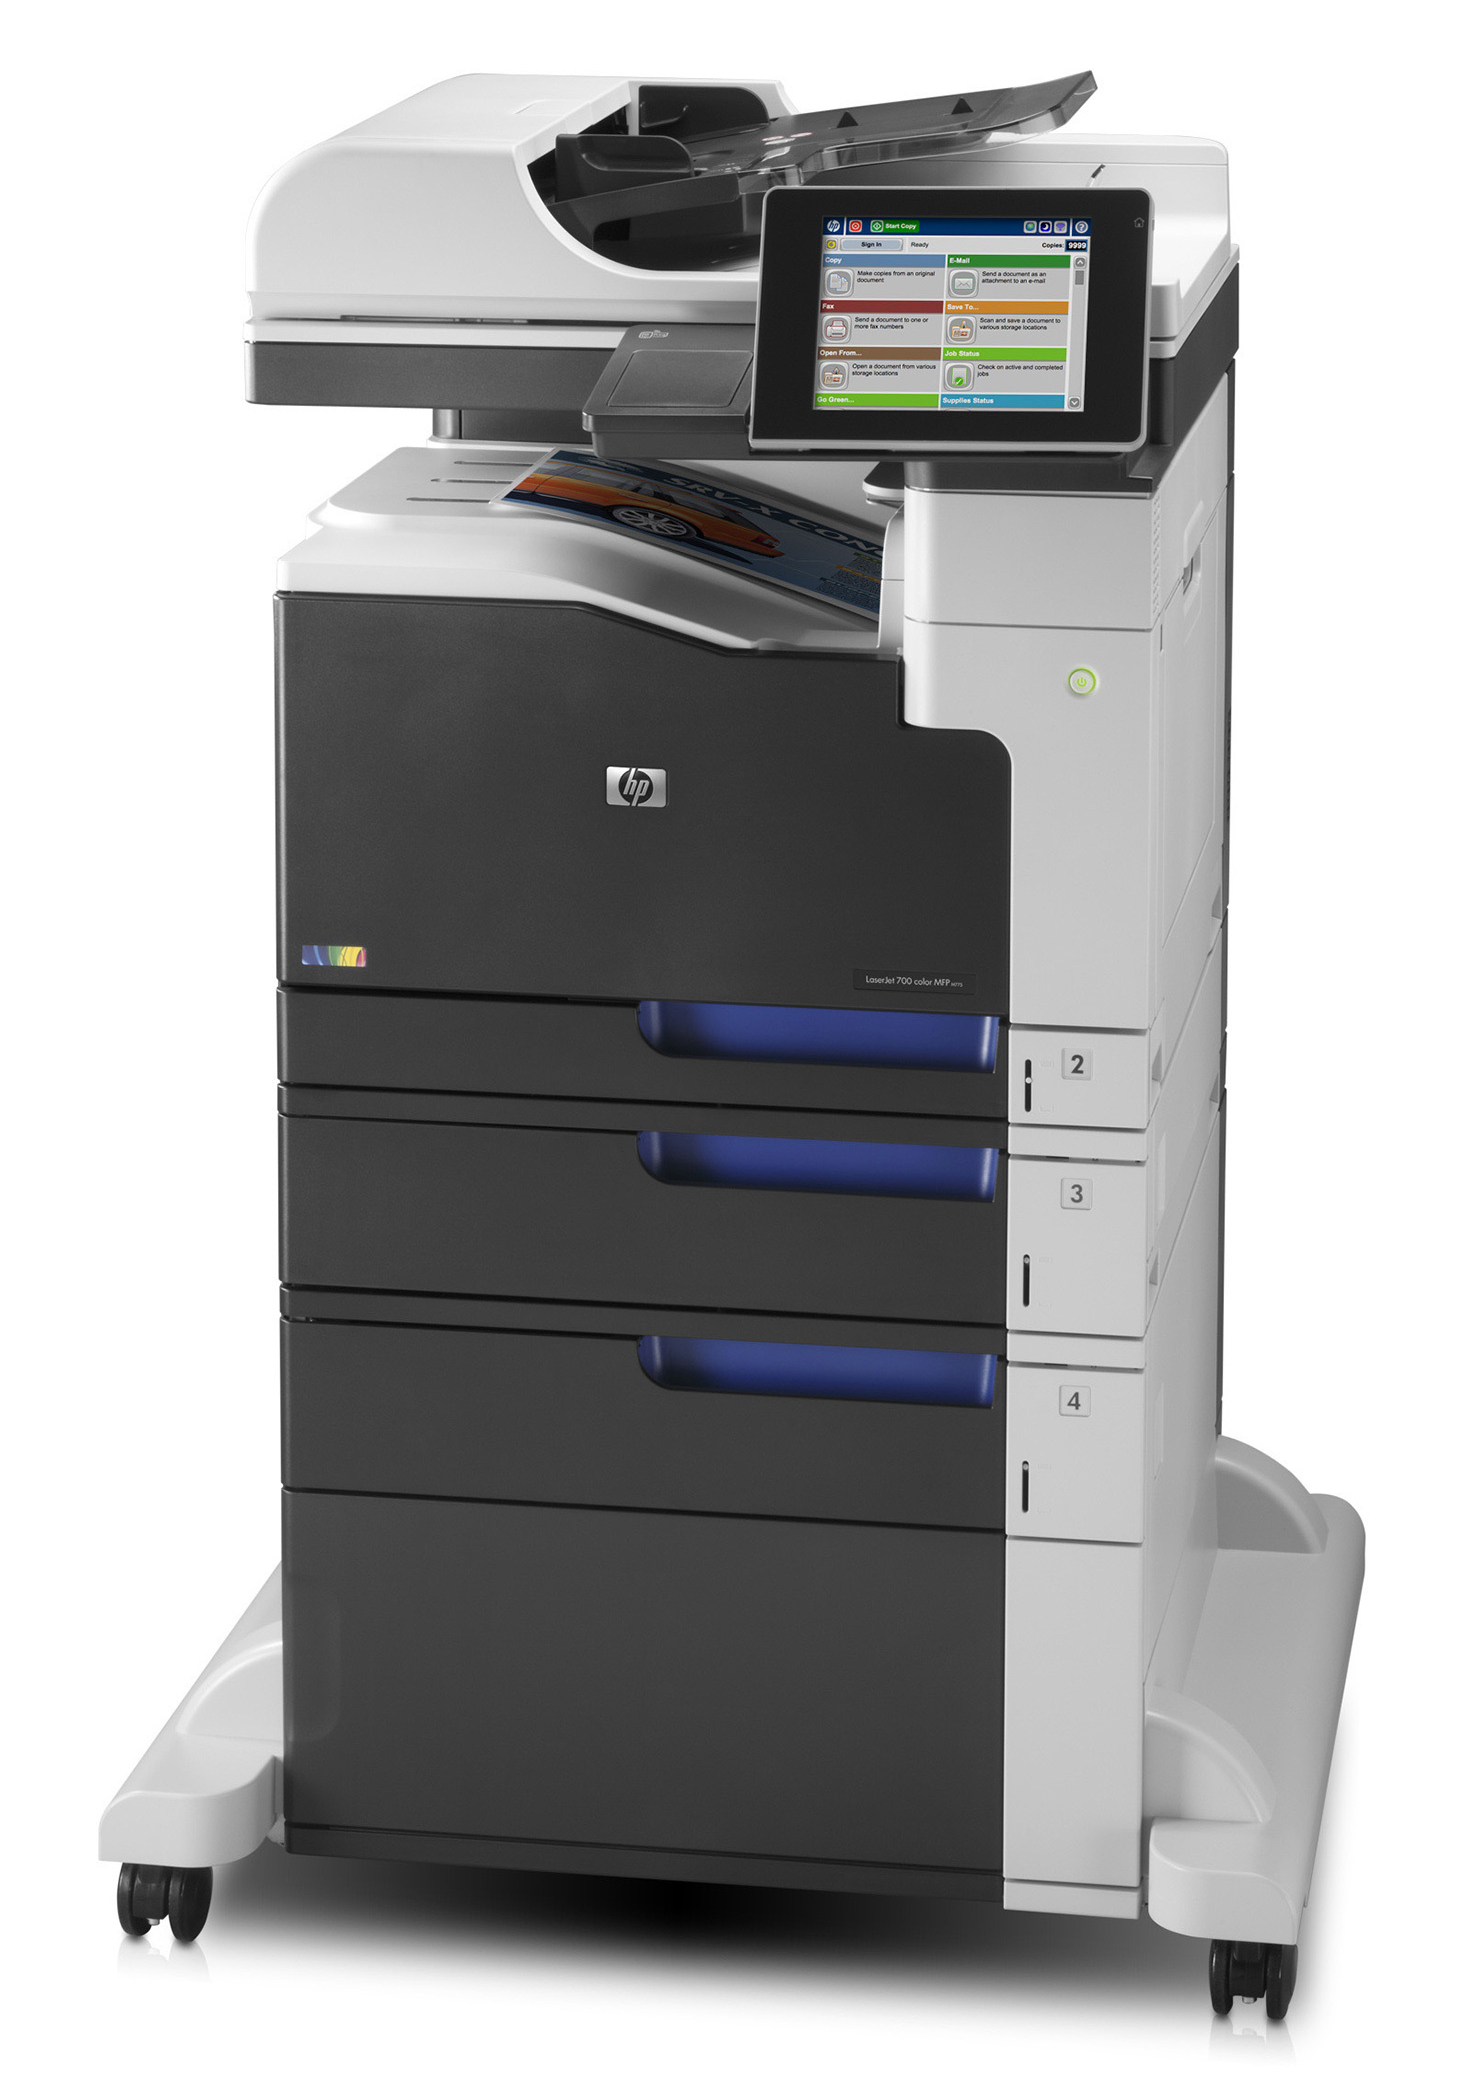 Multifunctionala Color HP LaserJet Enterprise 700 MFP M775, A3, Duplex, 30 PPM, 600 x 600, USB, RJ-45, Cartuse noi